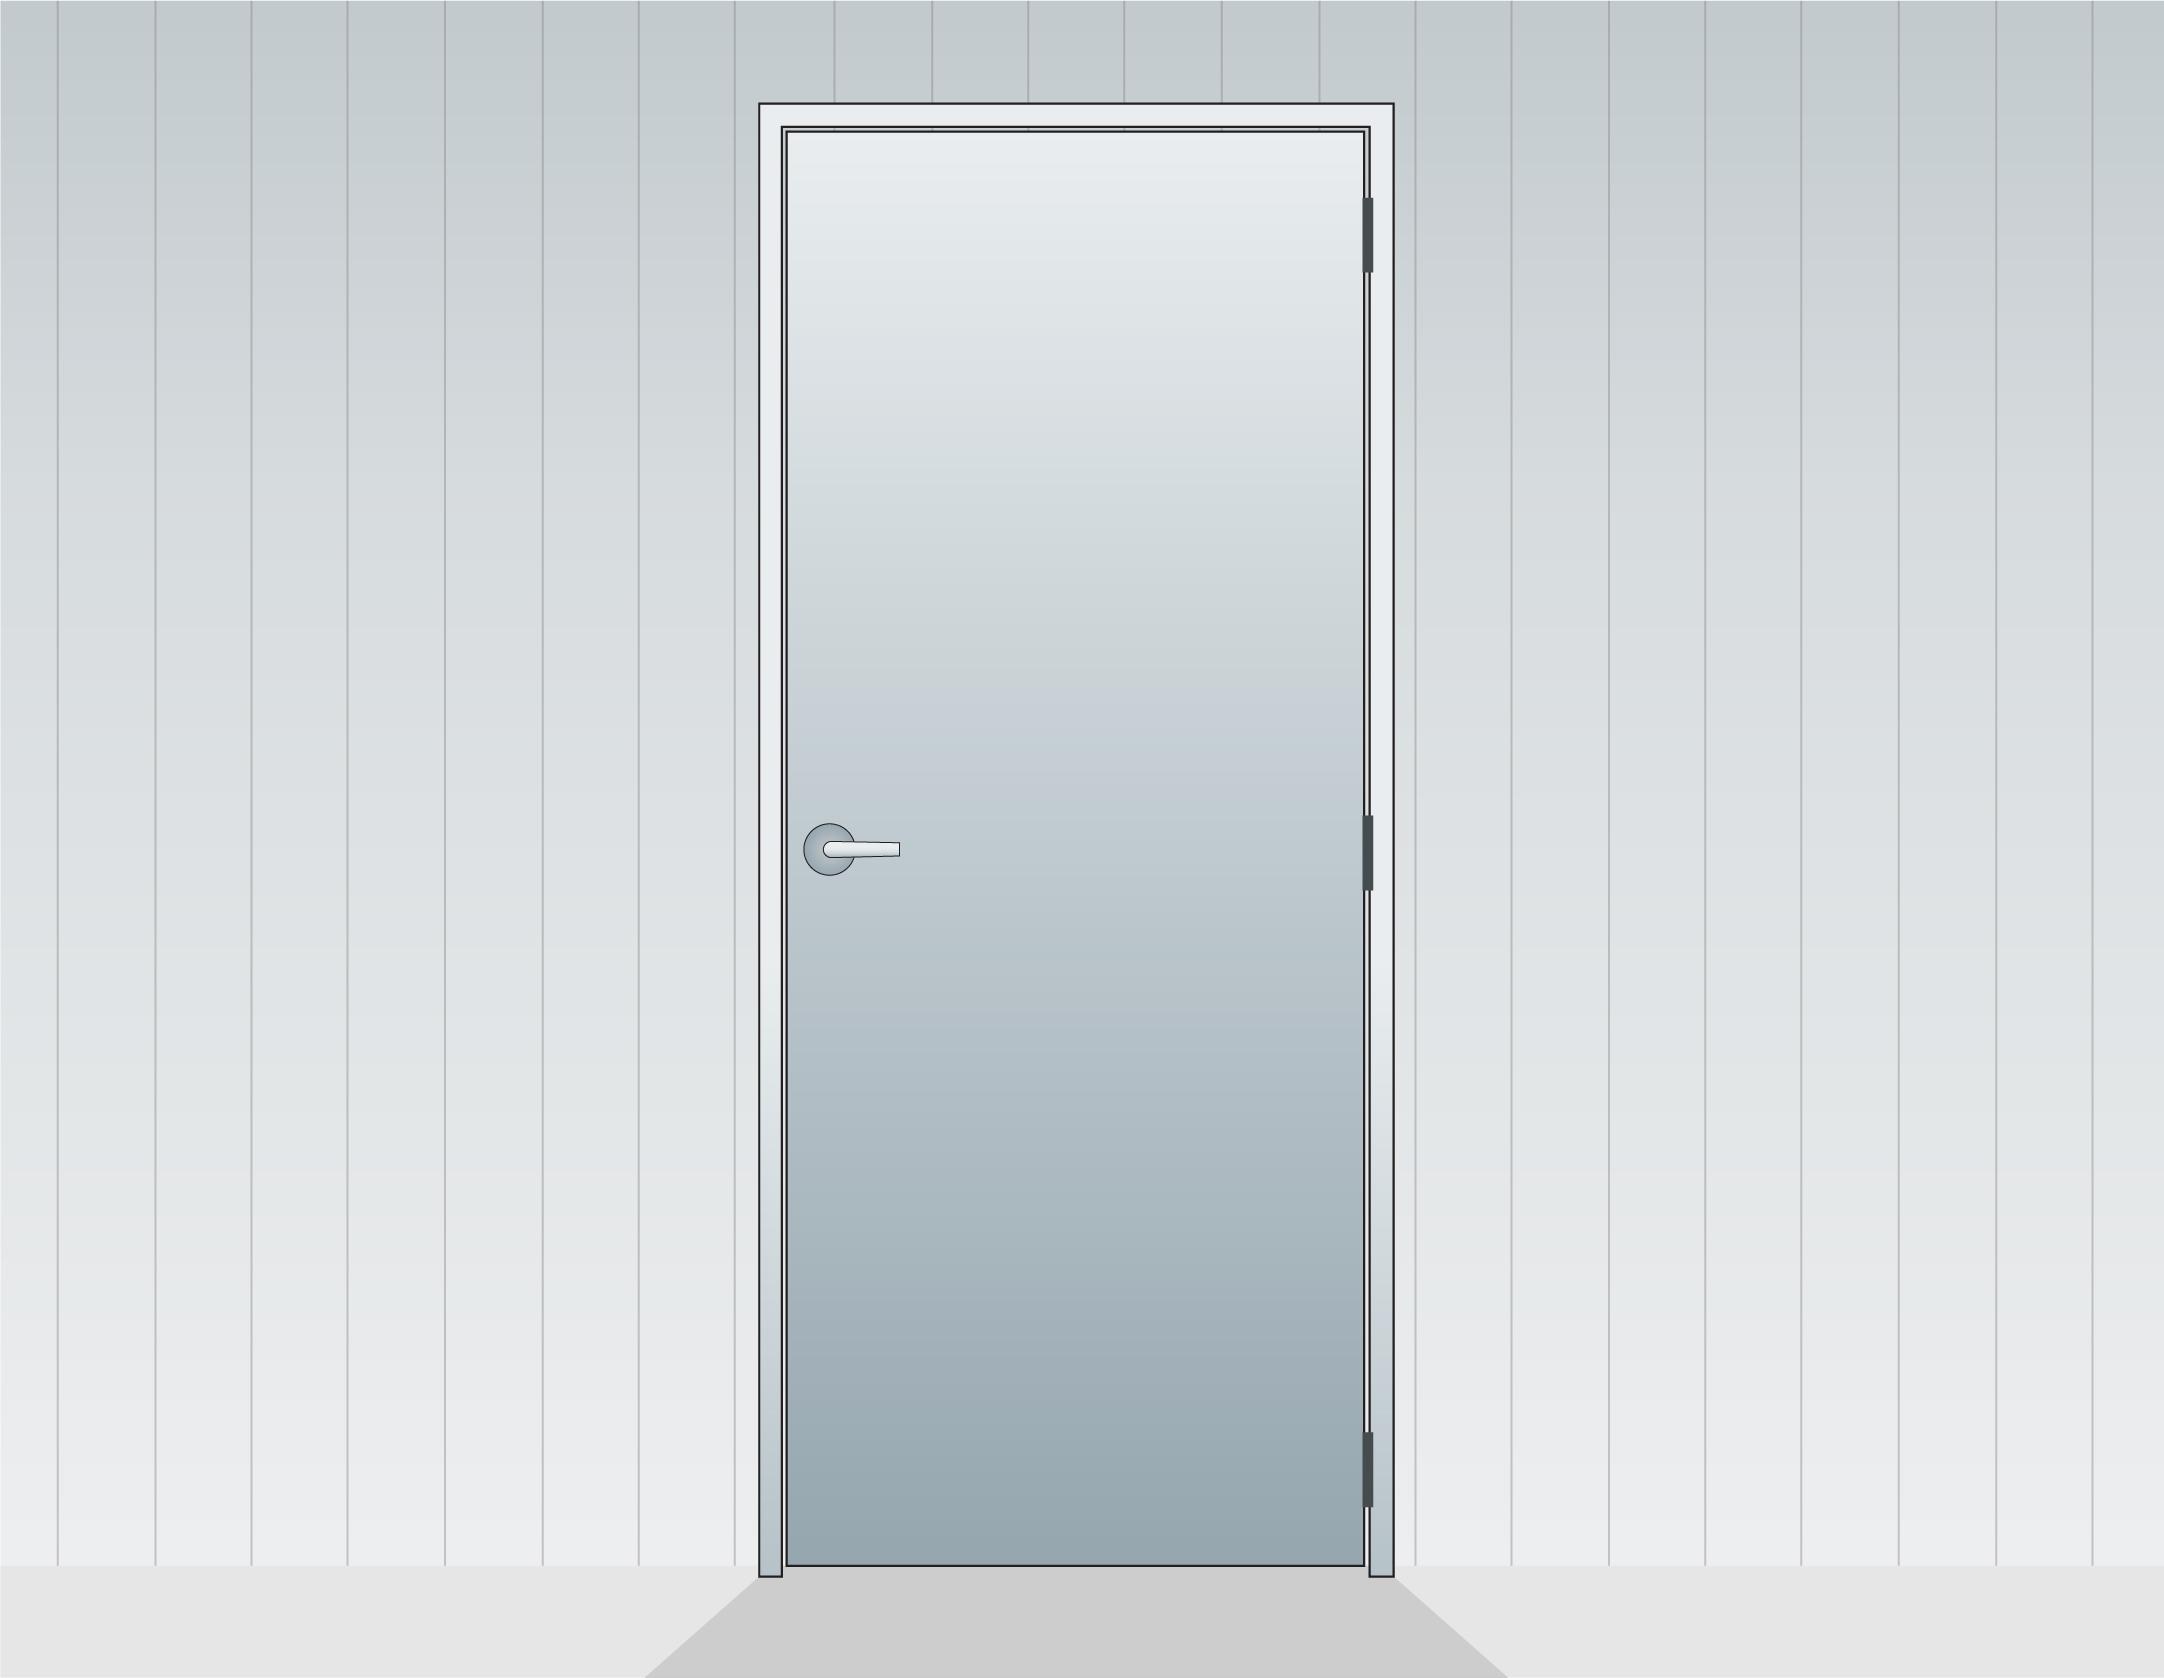 Personal Access Doors